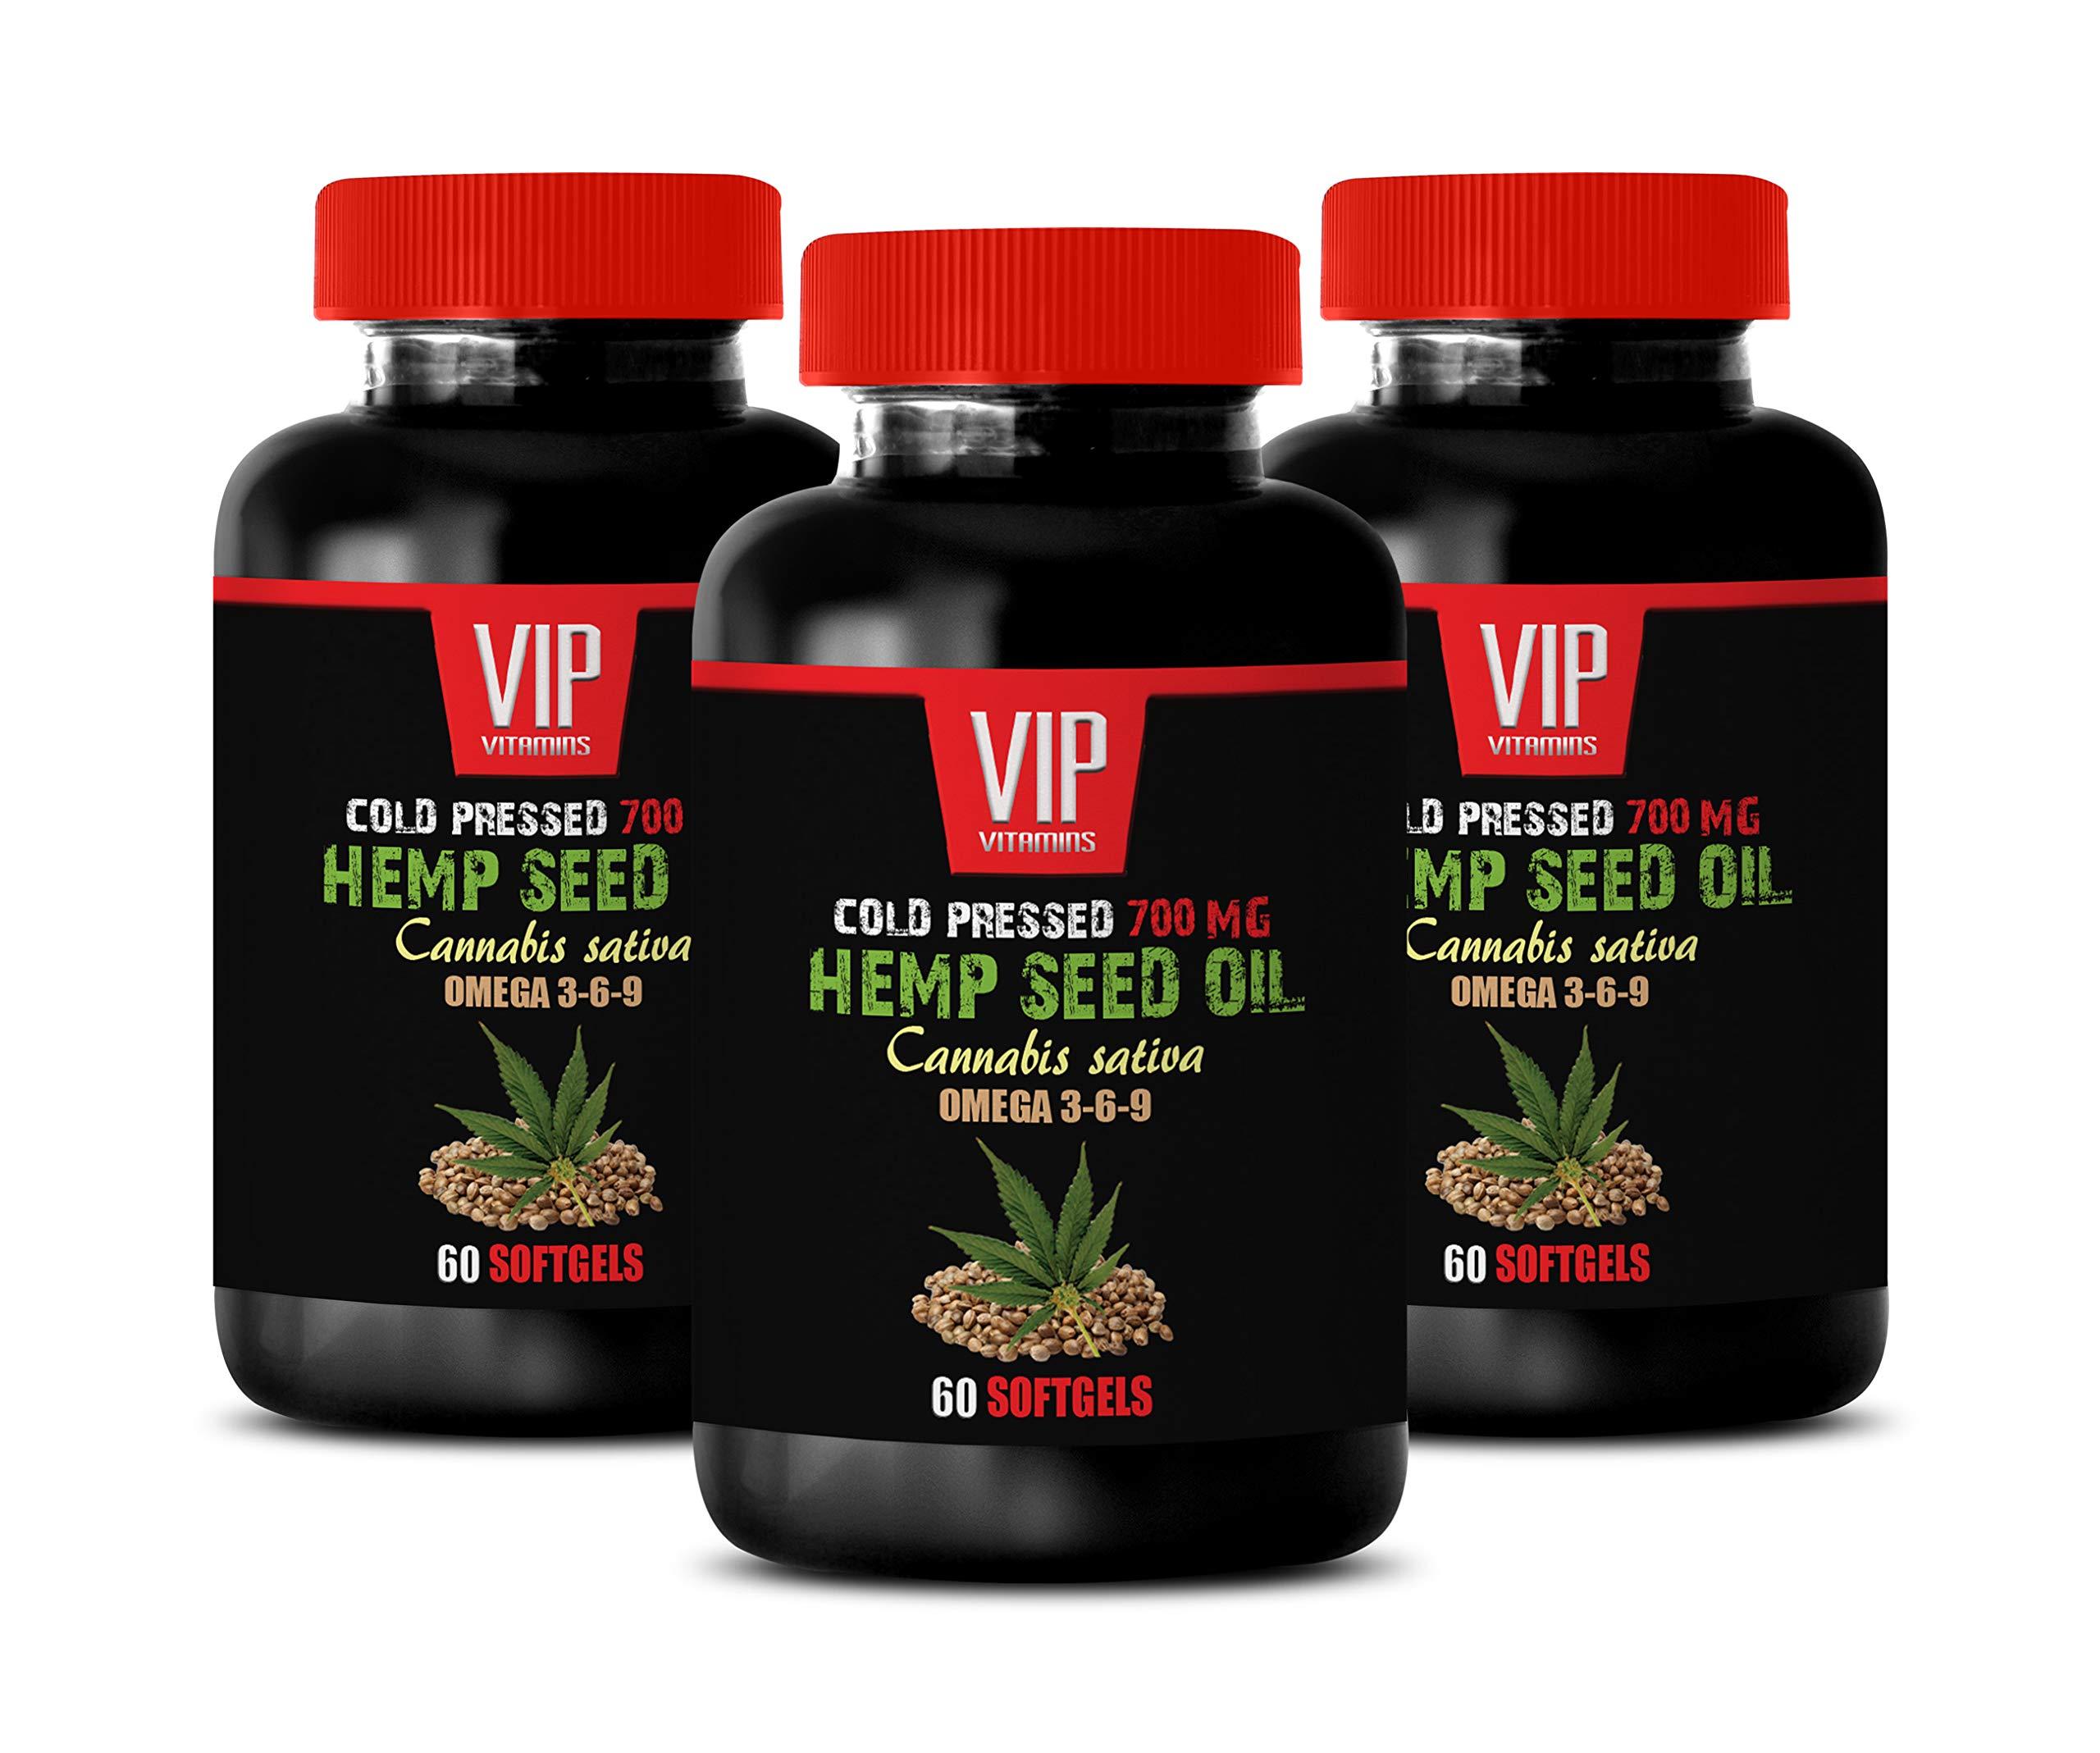 Stress Relief Vitamins for Women - Hemp Seed Oil - Cold Pressed 700 MG - Hemp Oil 700 mg - 3 Bottles 180 Softgels